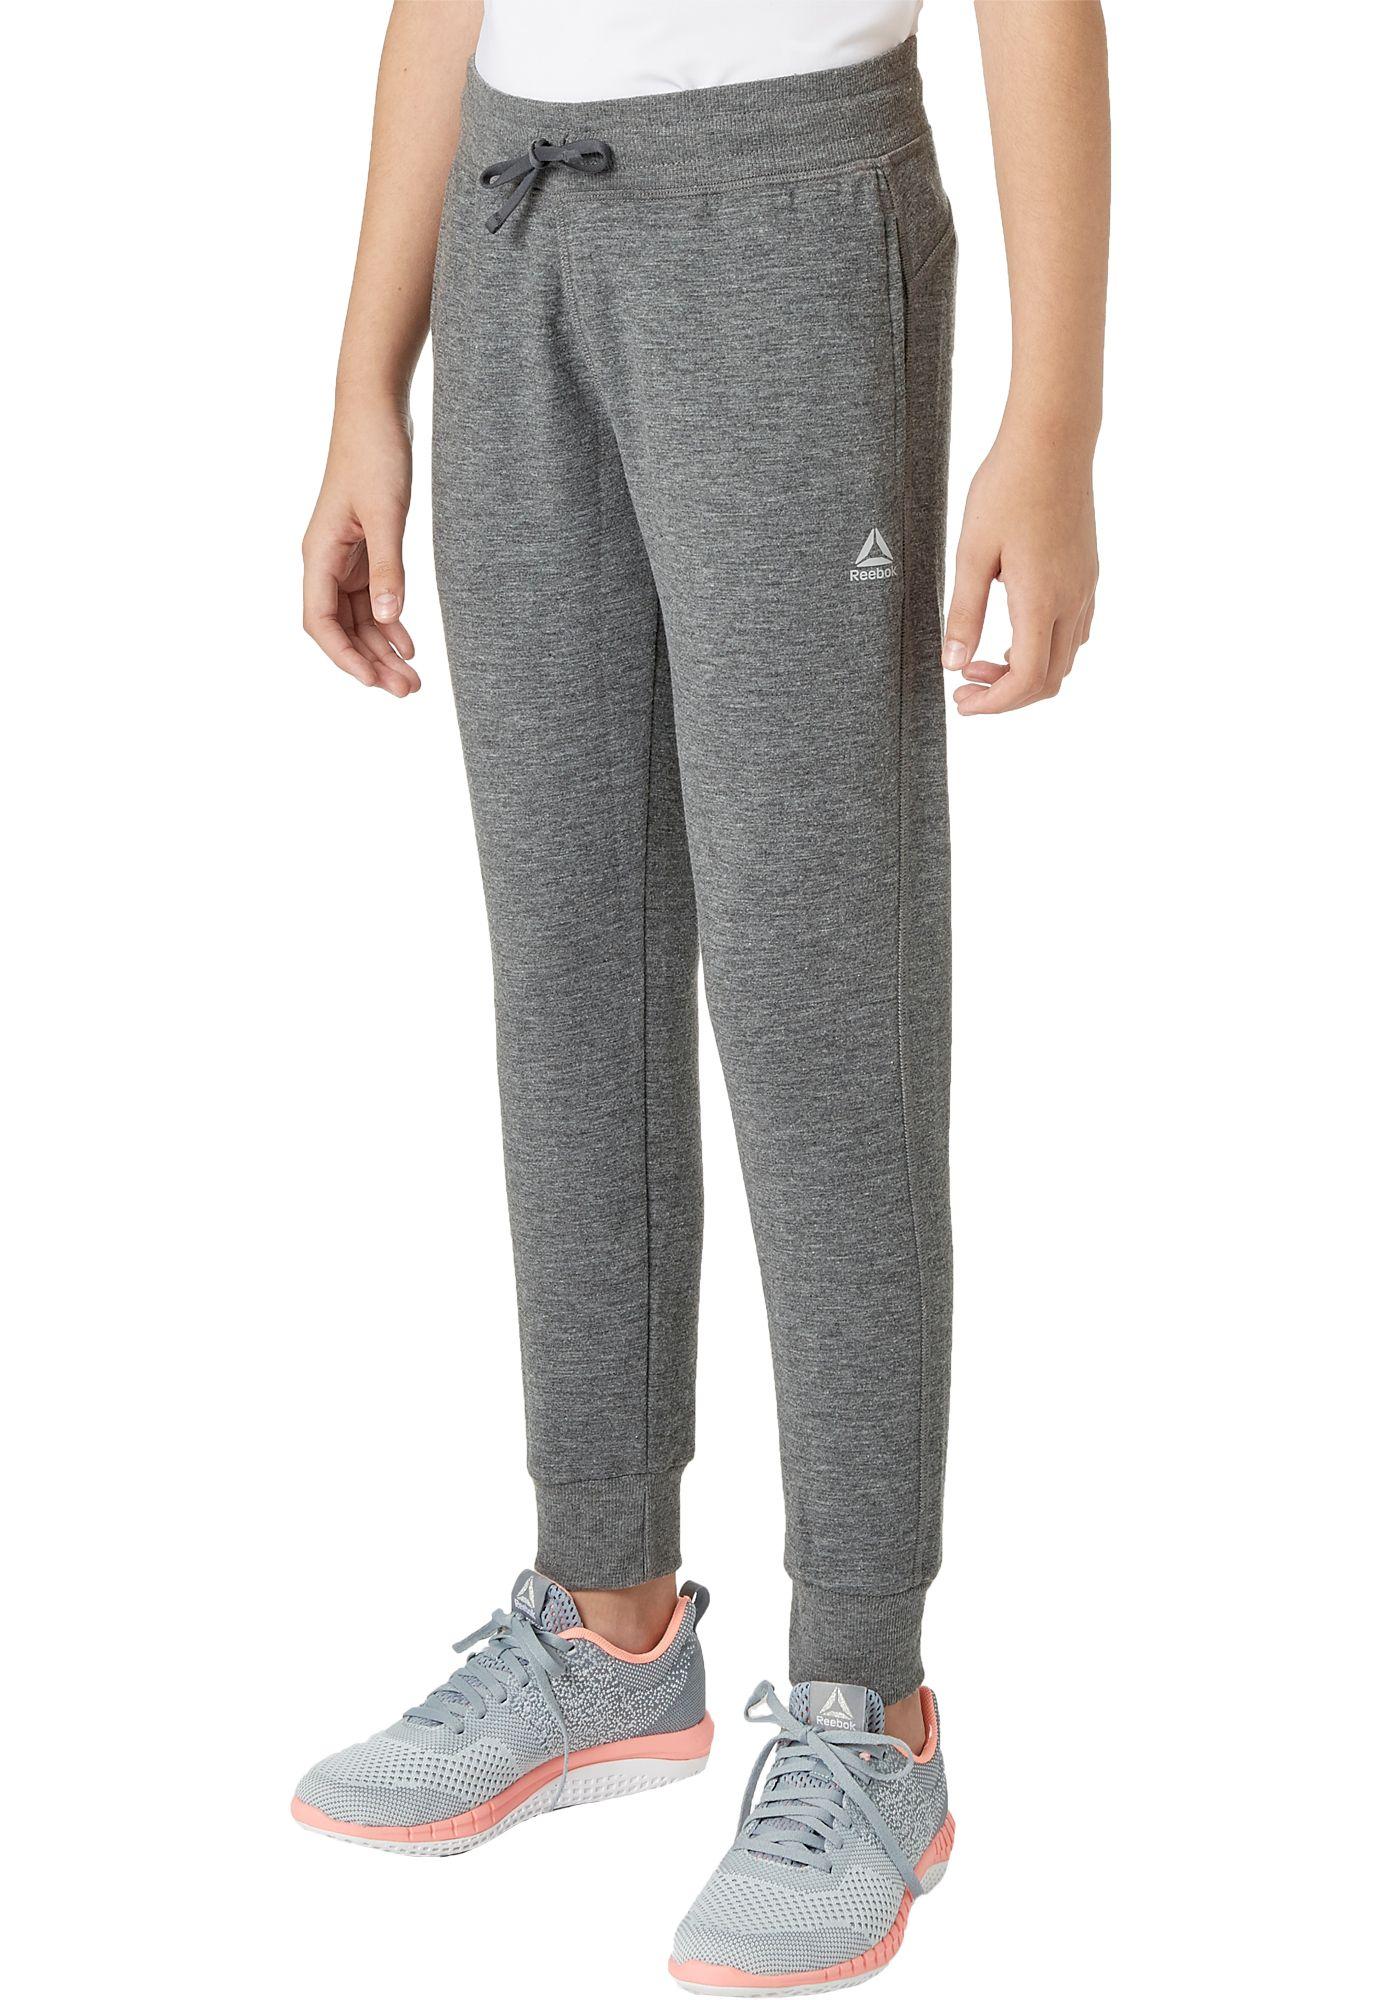 Reebok Girls' Heather Cotton Fleece Jogger Pants